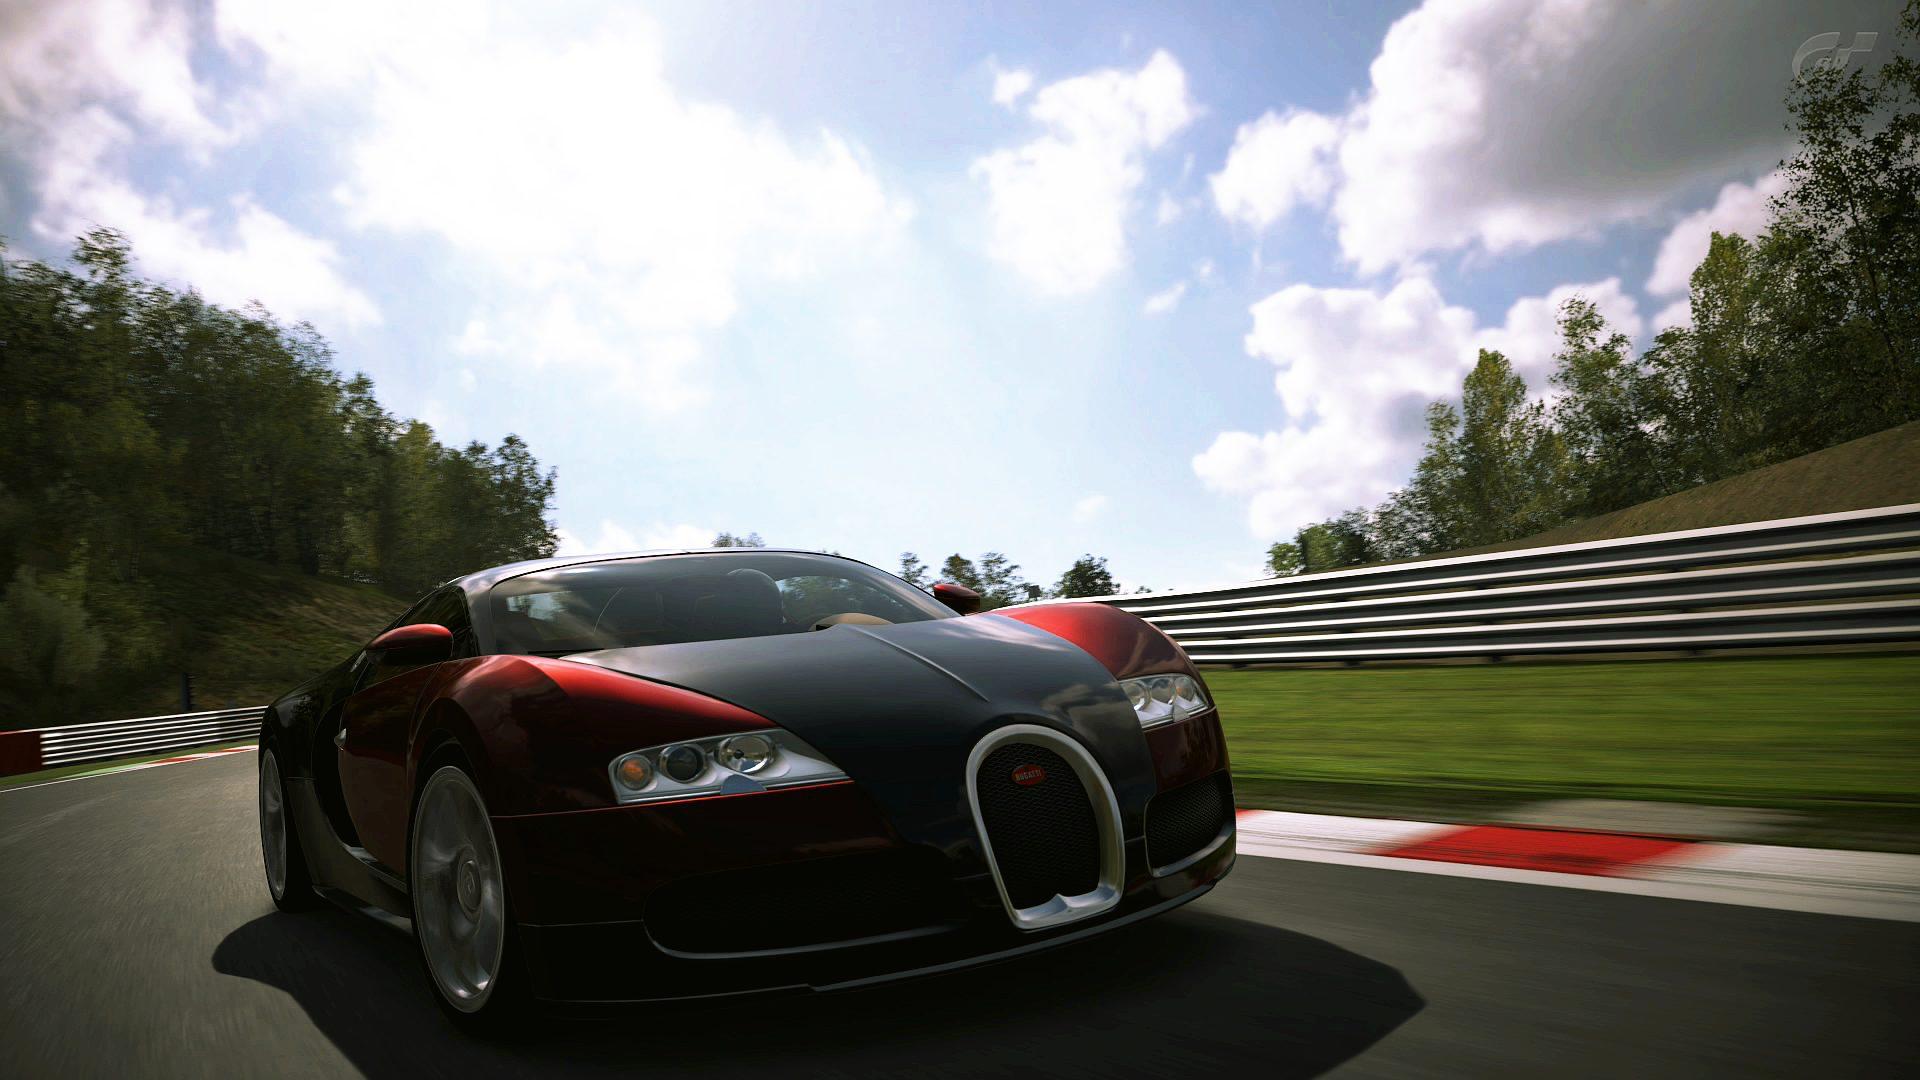 Bugatti Veyron on Spa_1.jpg